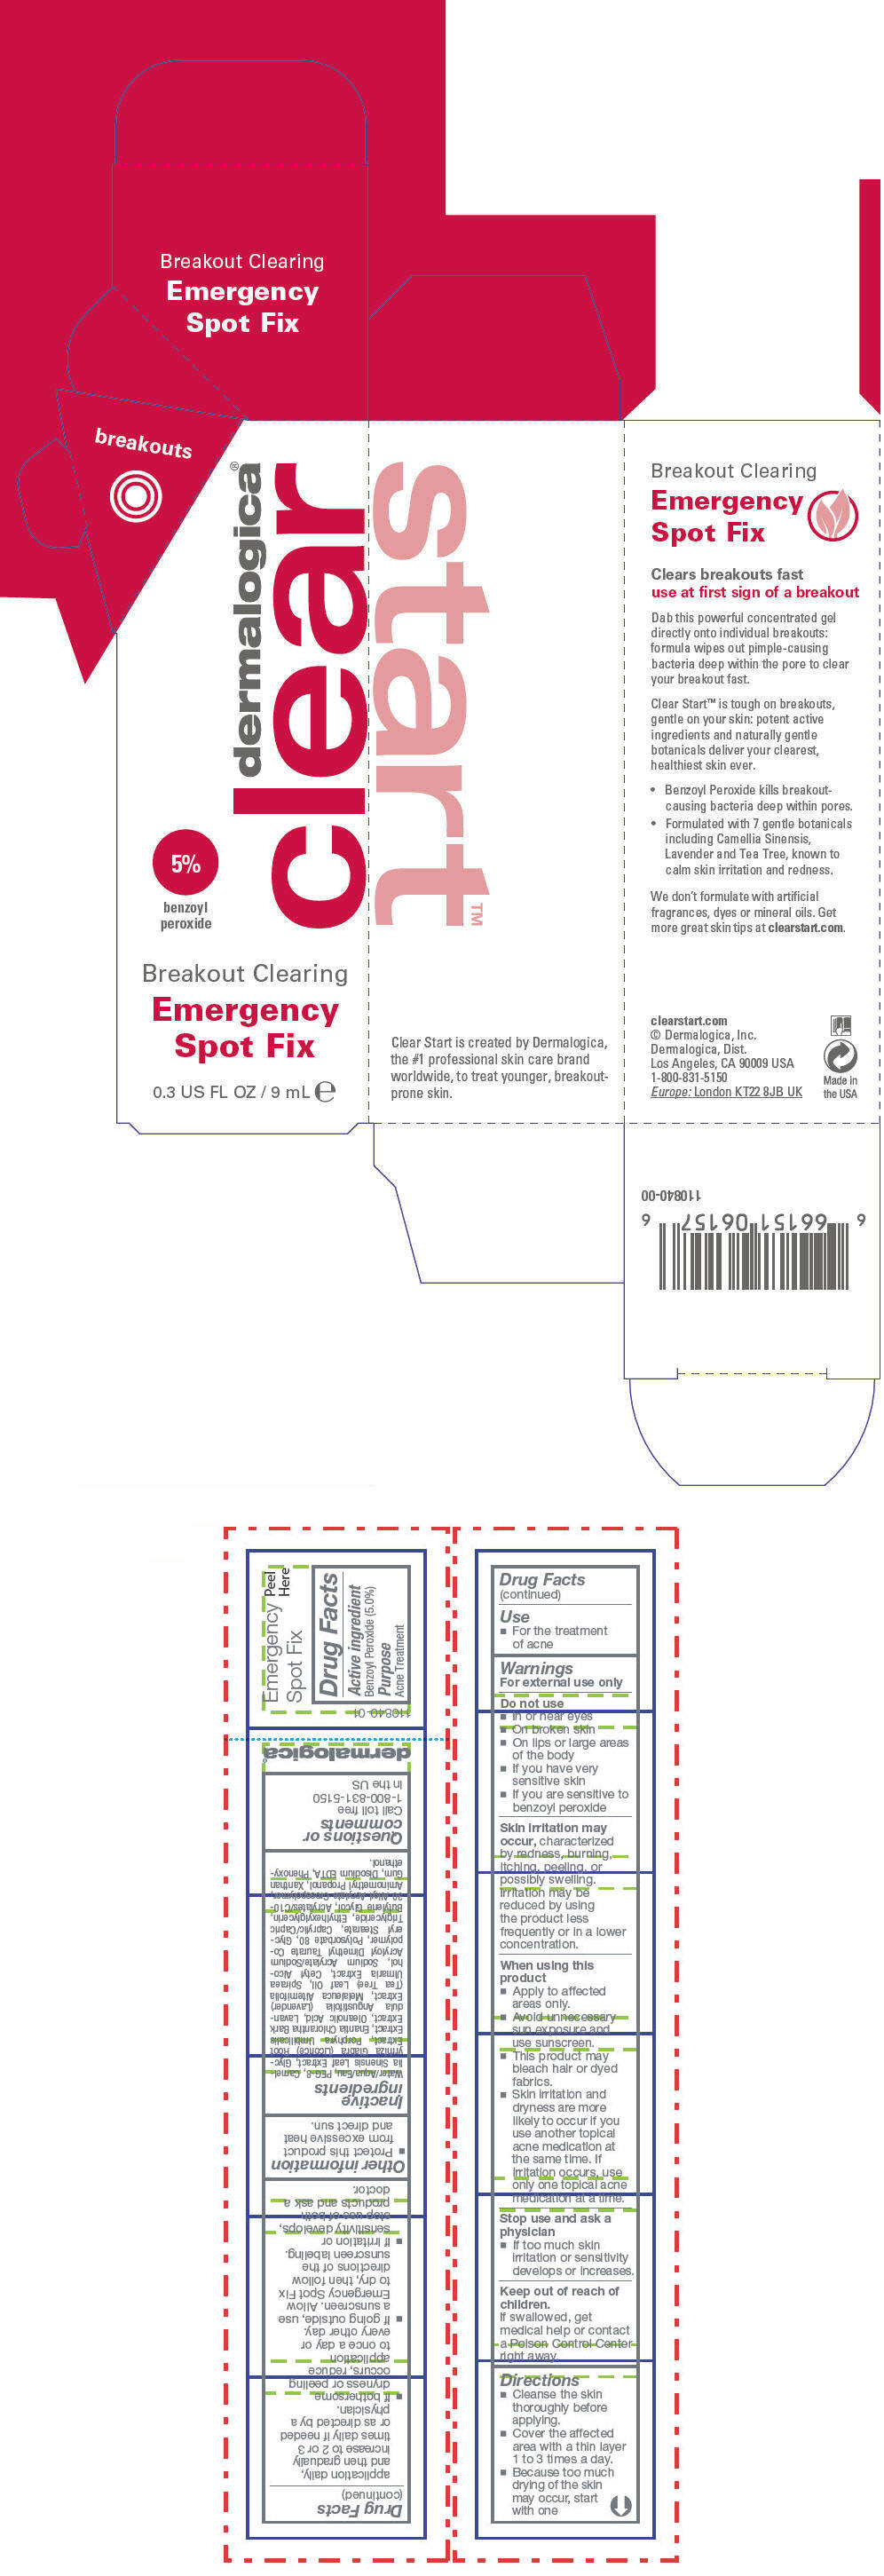 Breakout Clearing Emergency Spot Fix (Benzoyl Peroxide) Lotion [Dermalogica, Inc.]